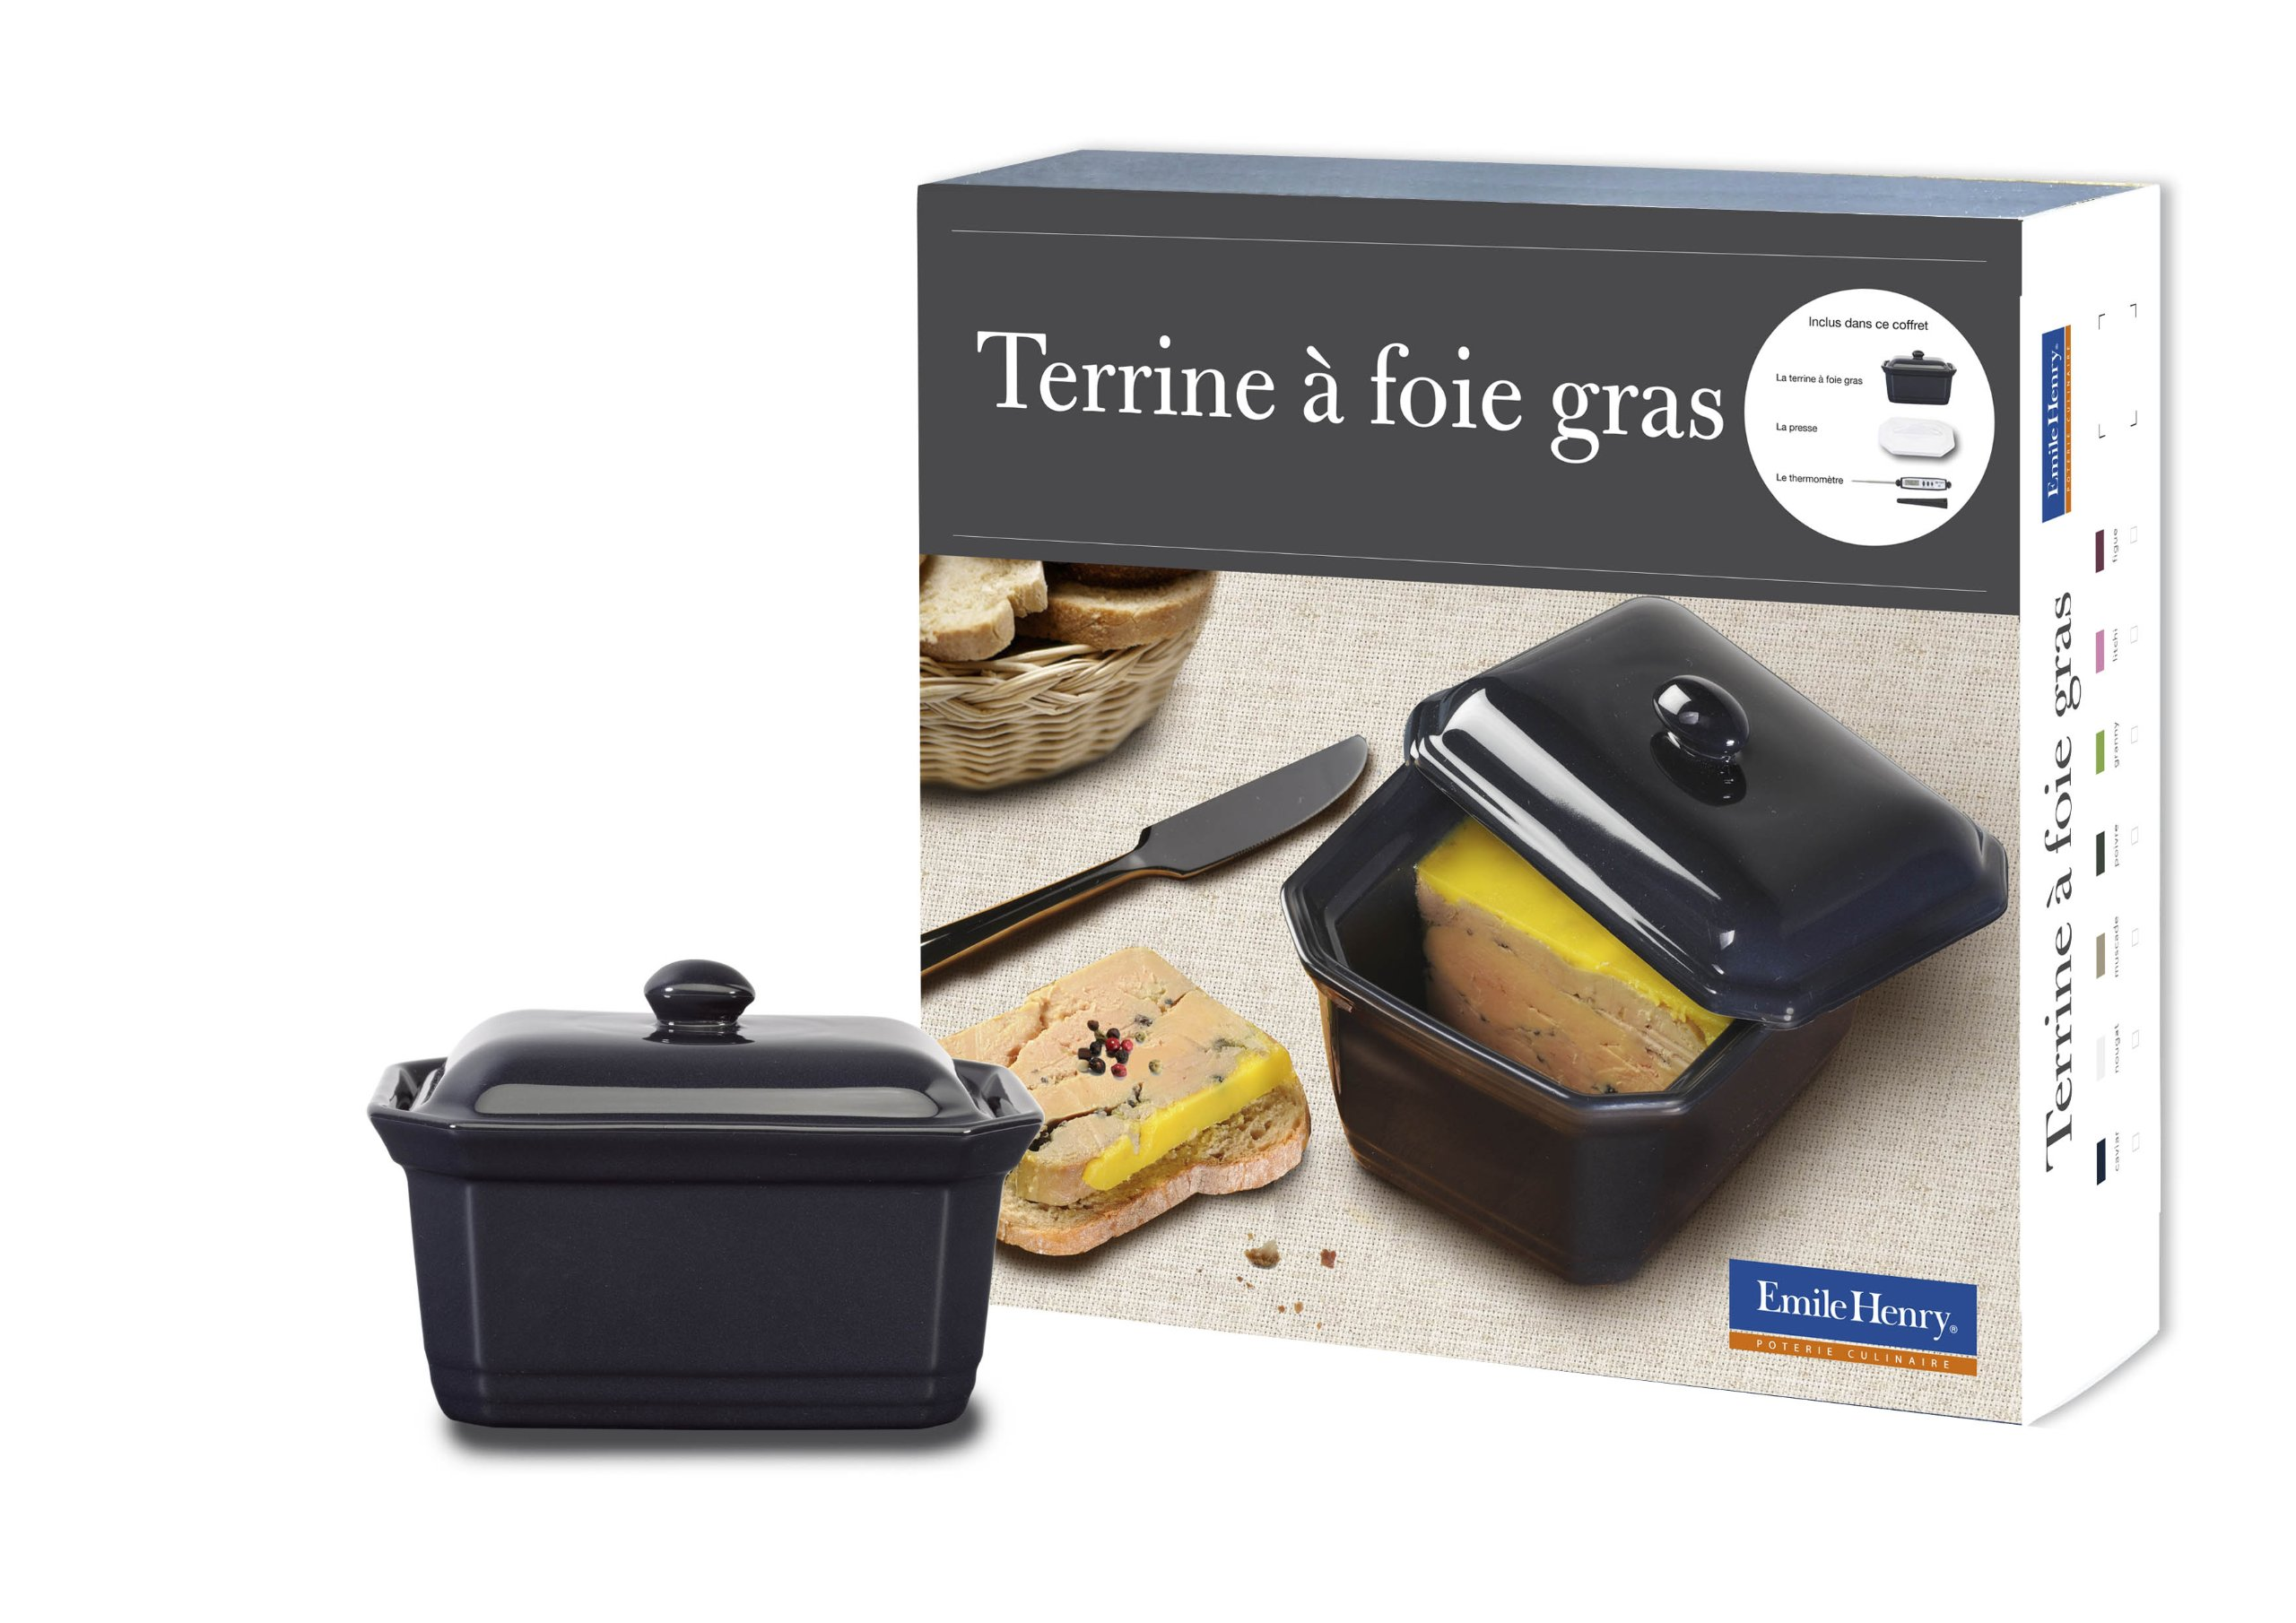 Emile Henry - 439860 - Foie Gras Gift Set: Terrine, Press & Thermometer - Colour Caviar